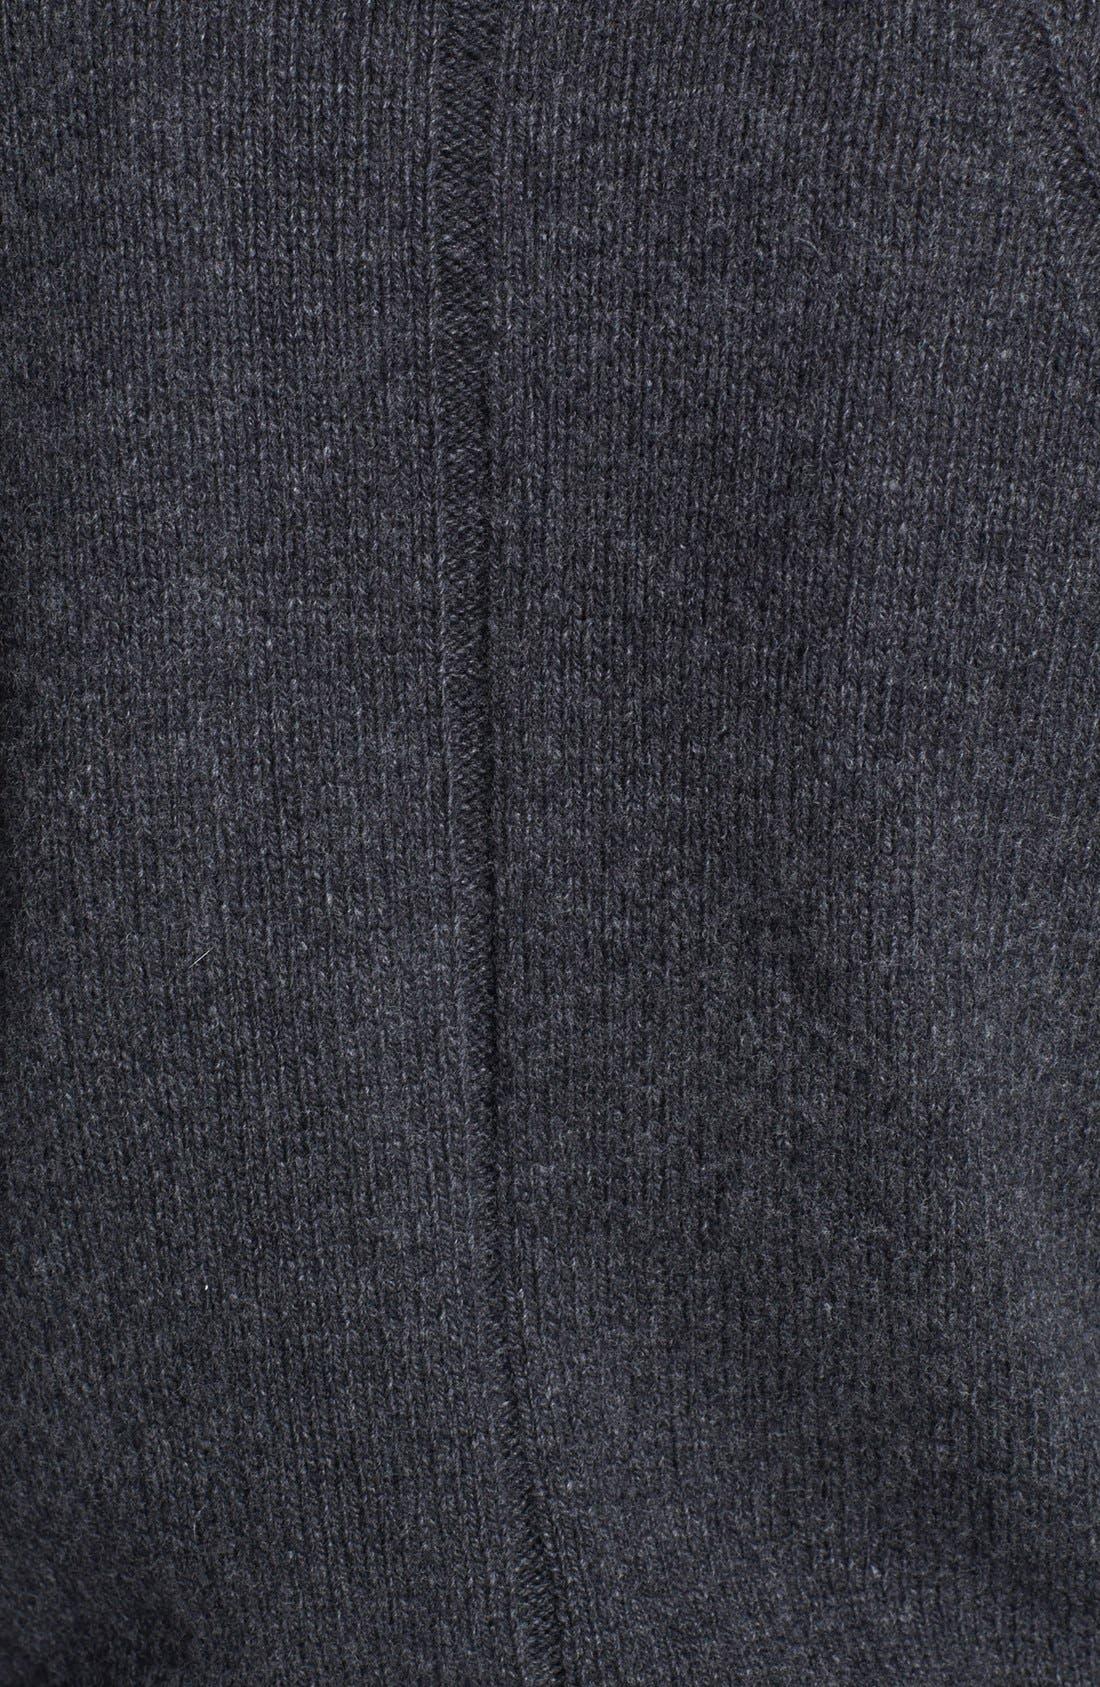 Alternate Image 3  - Diane von Furstenberg 'Cortina' Genuine Rabbit Fur Front Cardigan